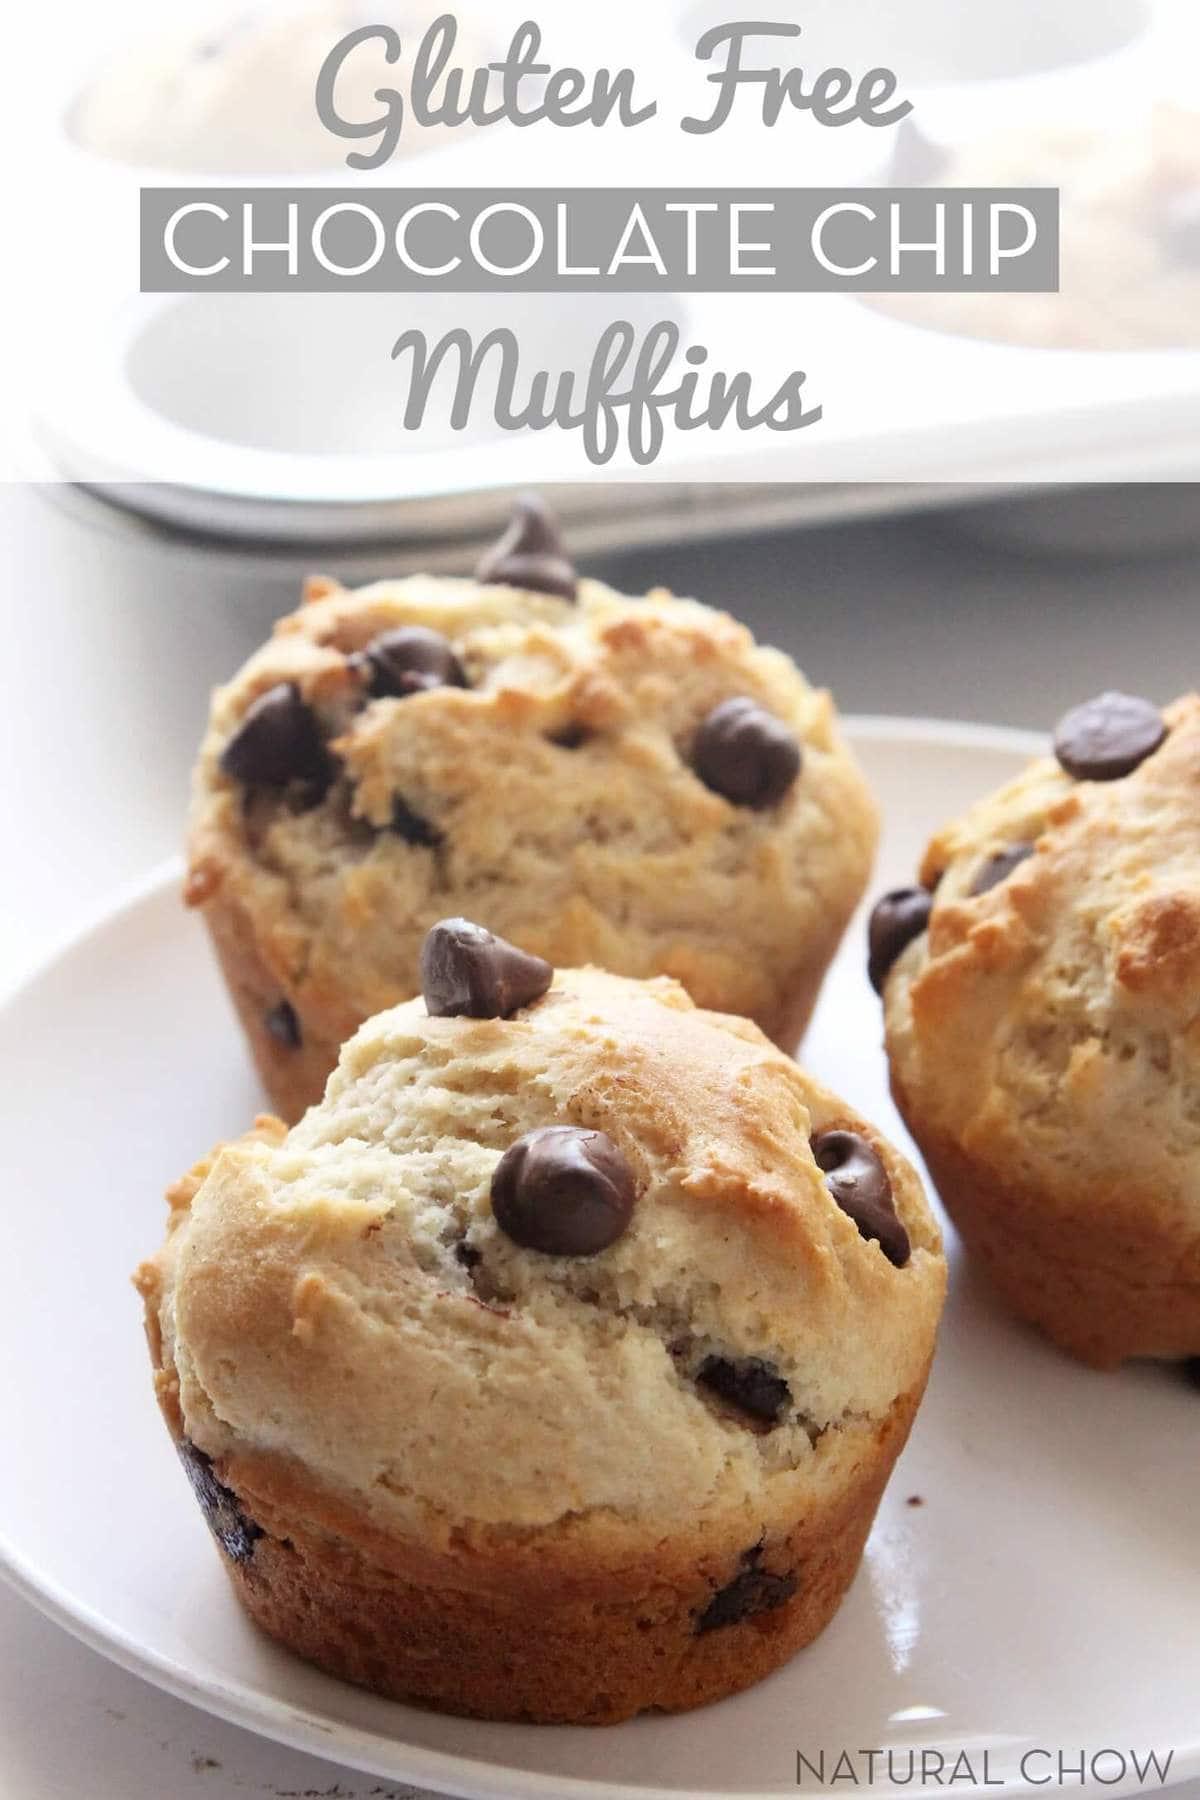 50+ Back to School Grab n Go Breakfasts Recipes - Julie's ...